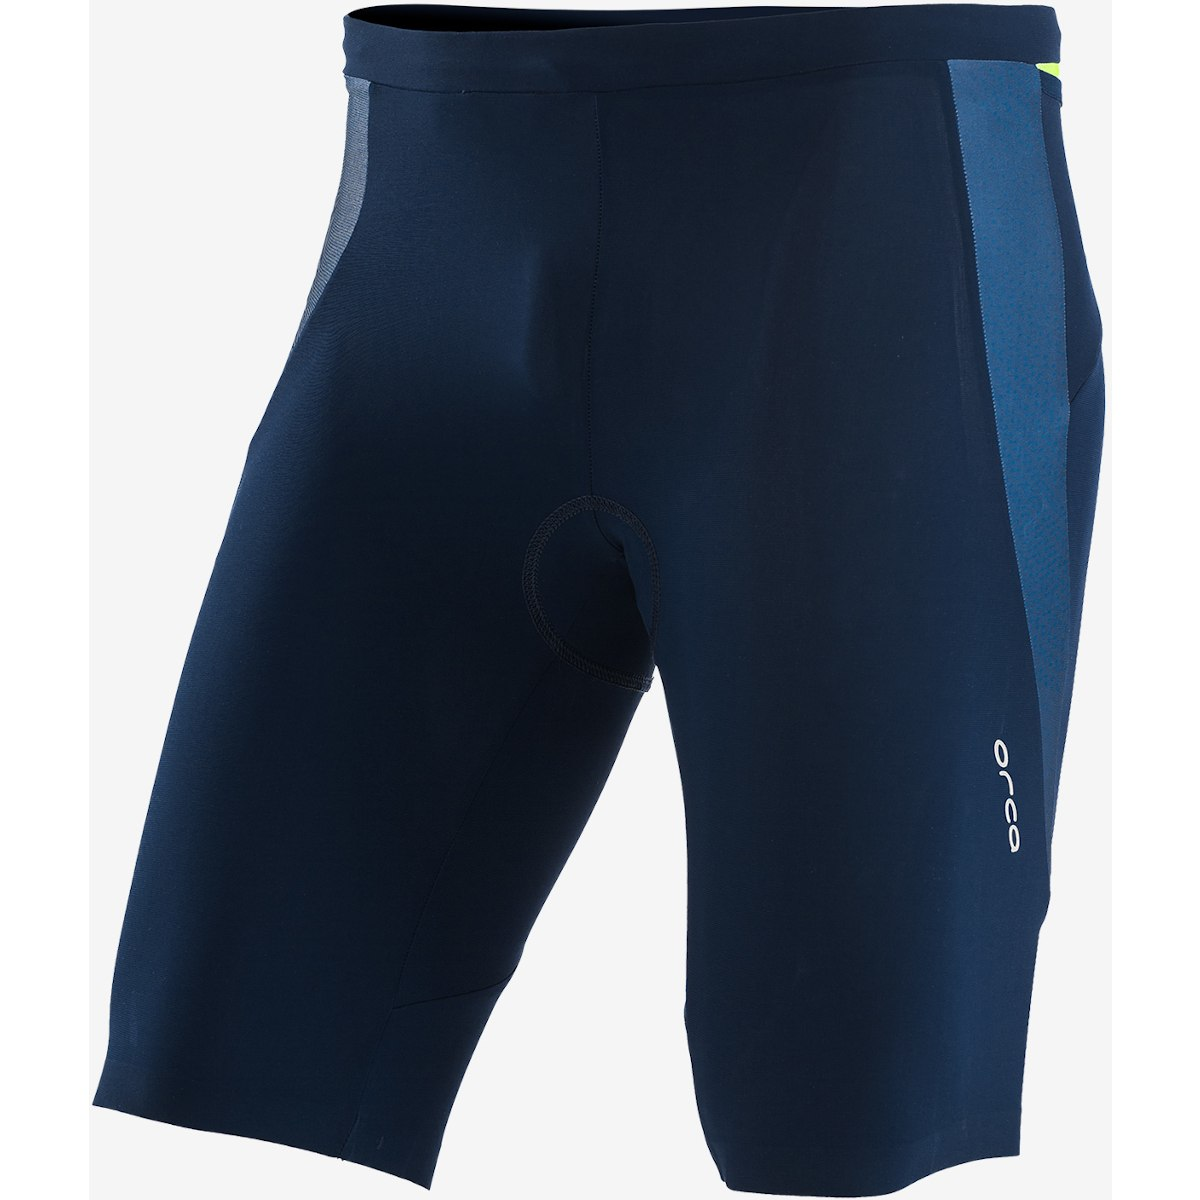 Foto de Orca 226 Kompress Tri Tech Pants Men - blue/green